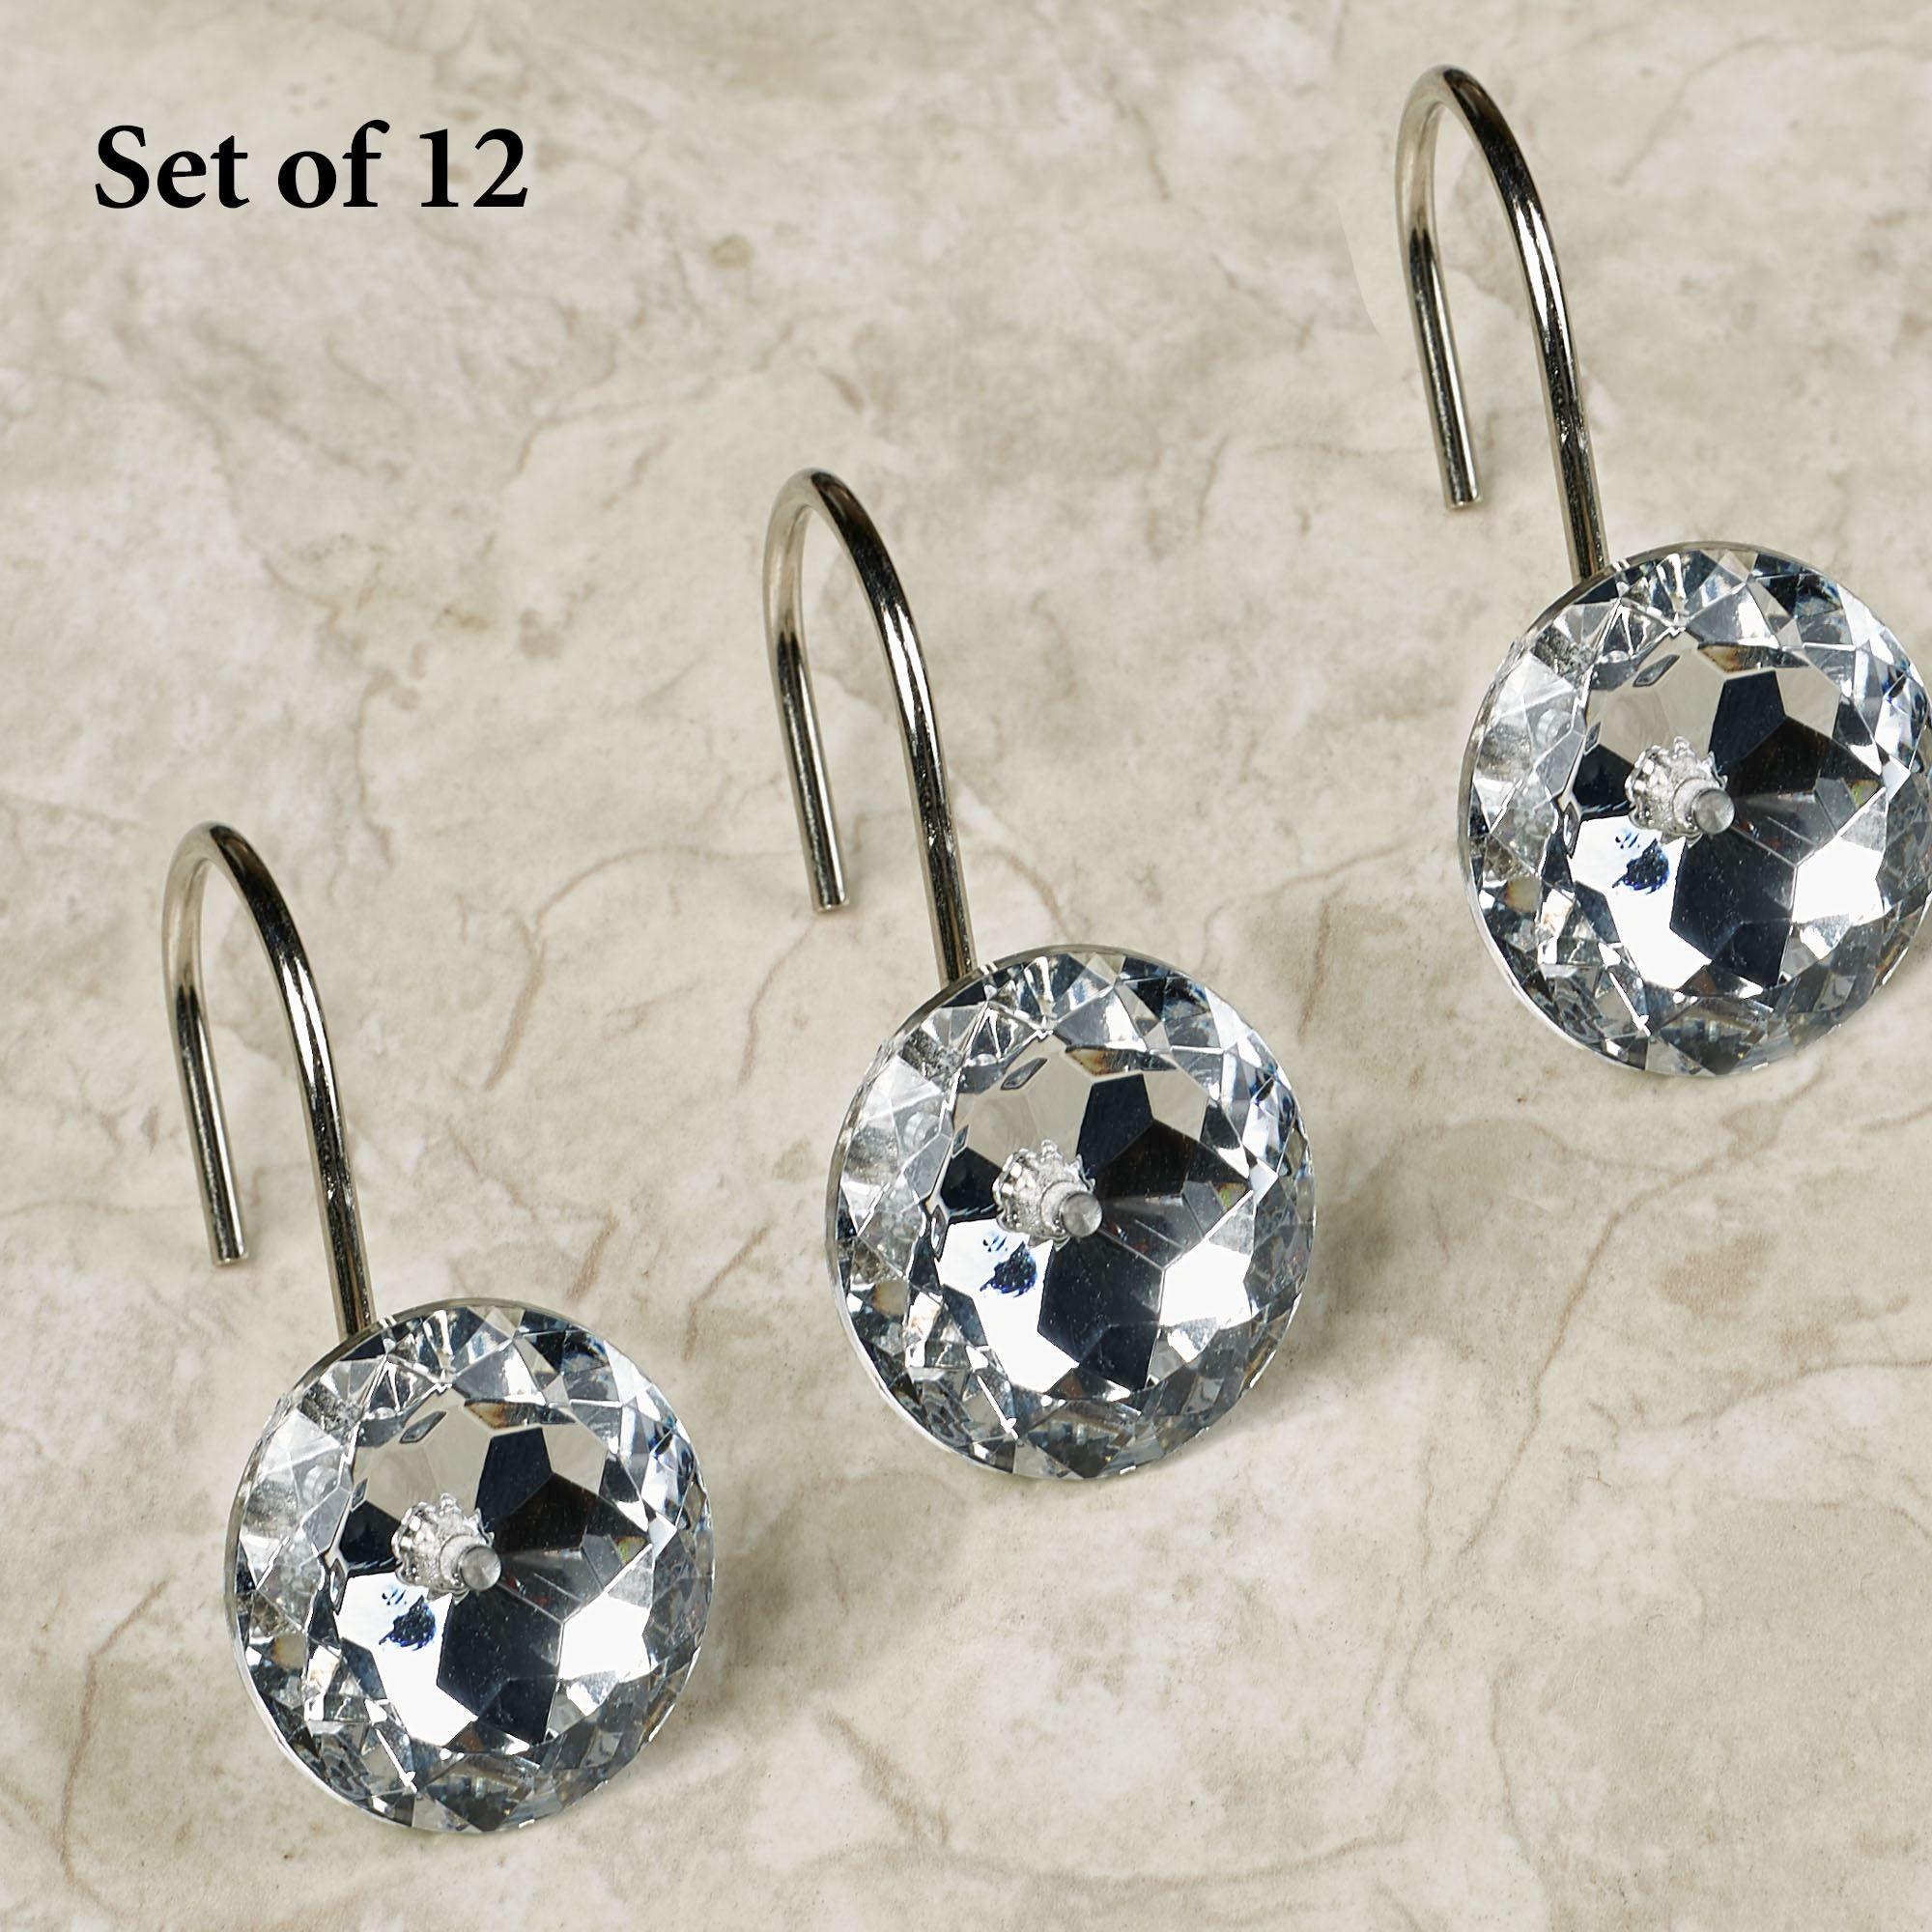 Regal Jeweled Shower Curtain Hook Set